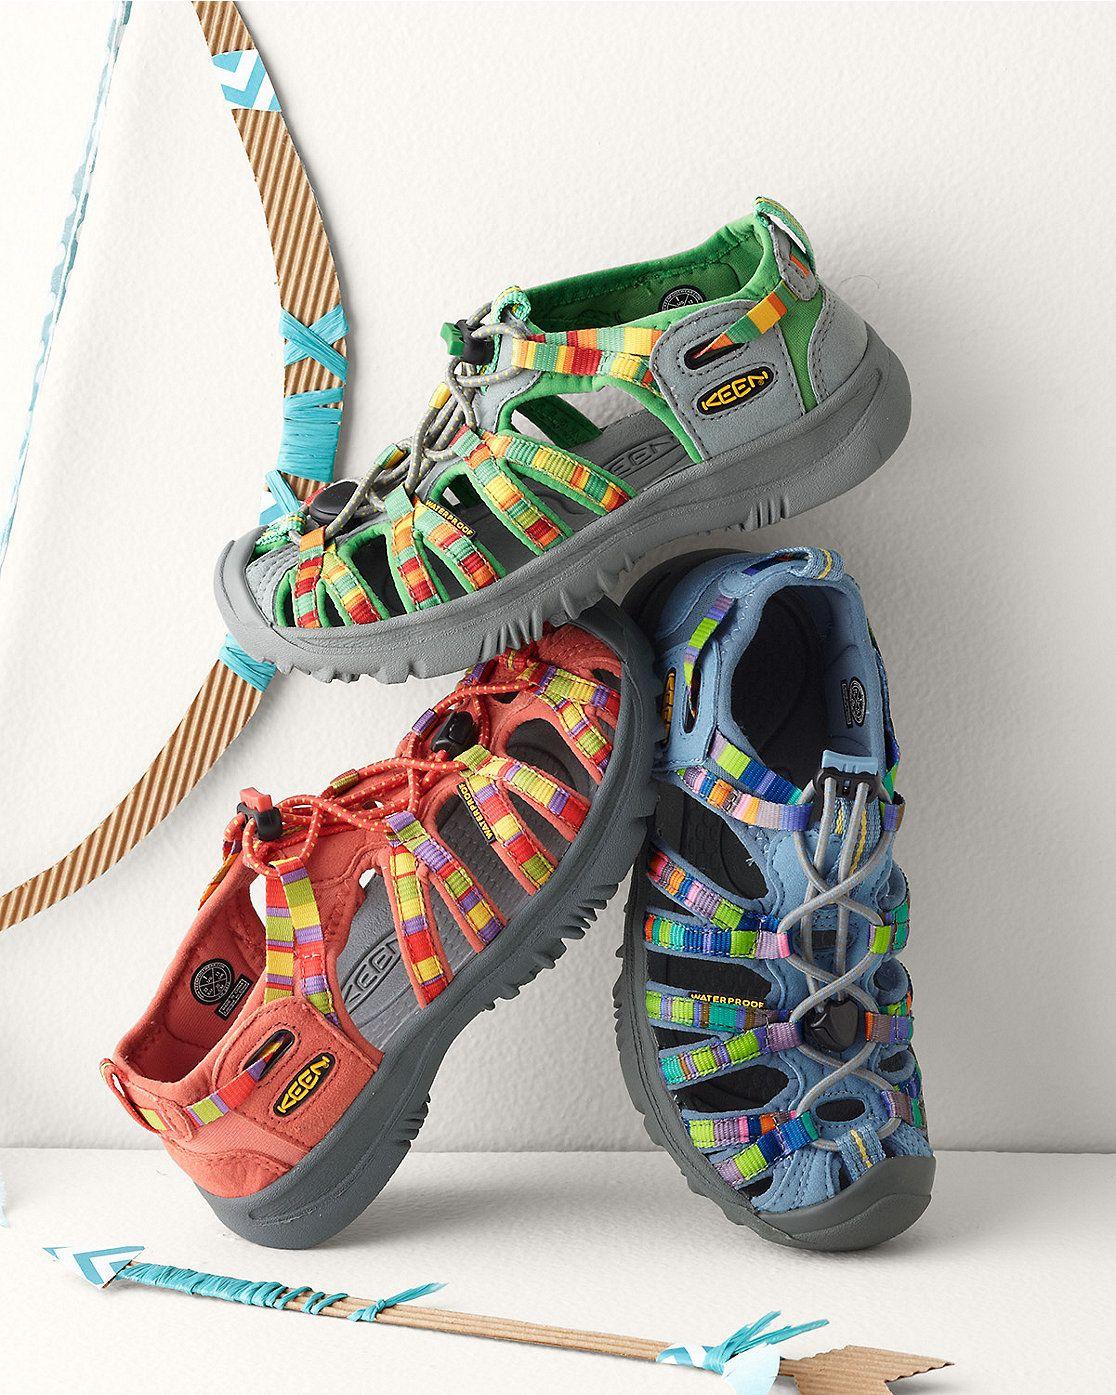 2c26c851345b Keen Whisper Sandals